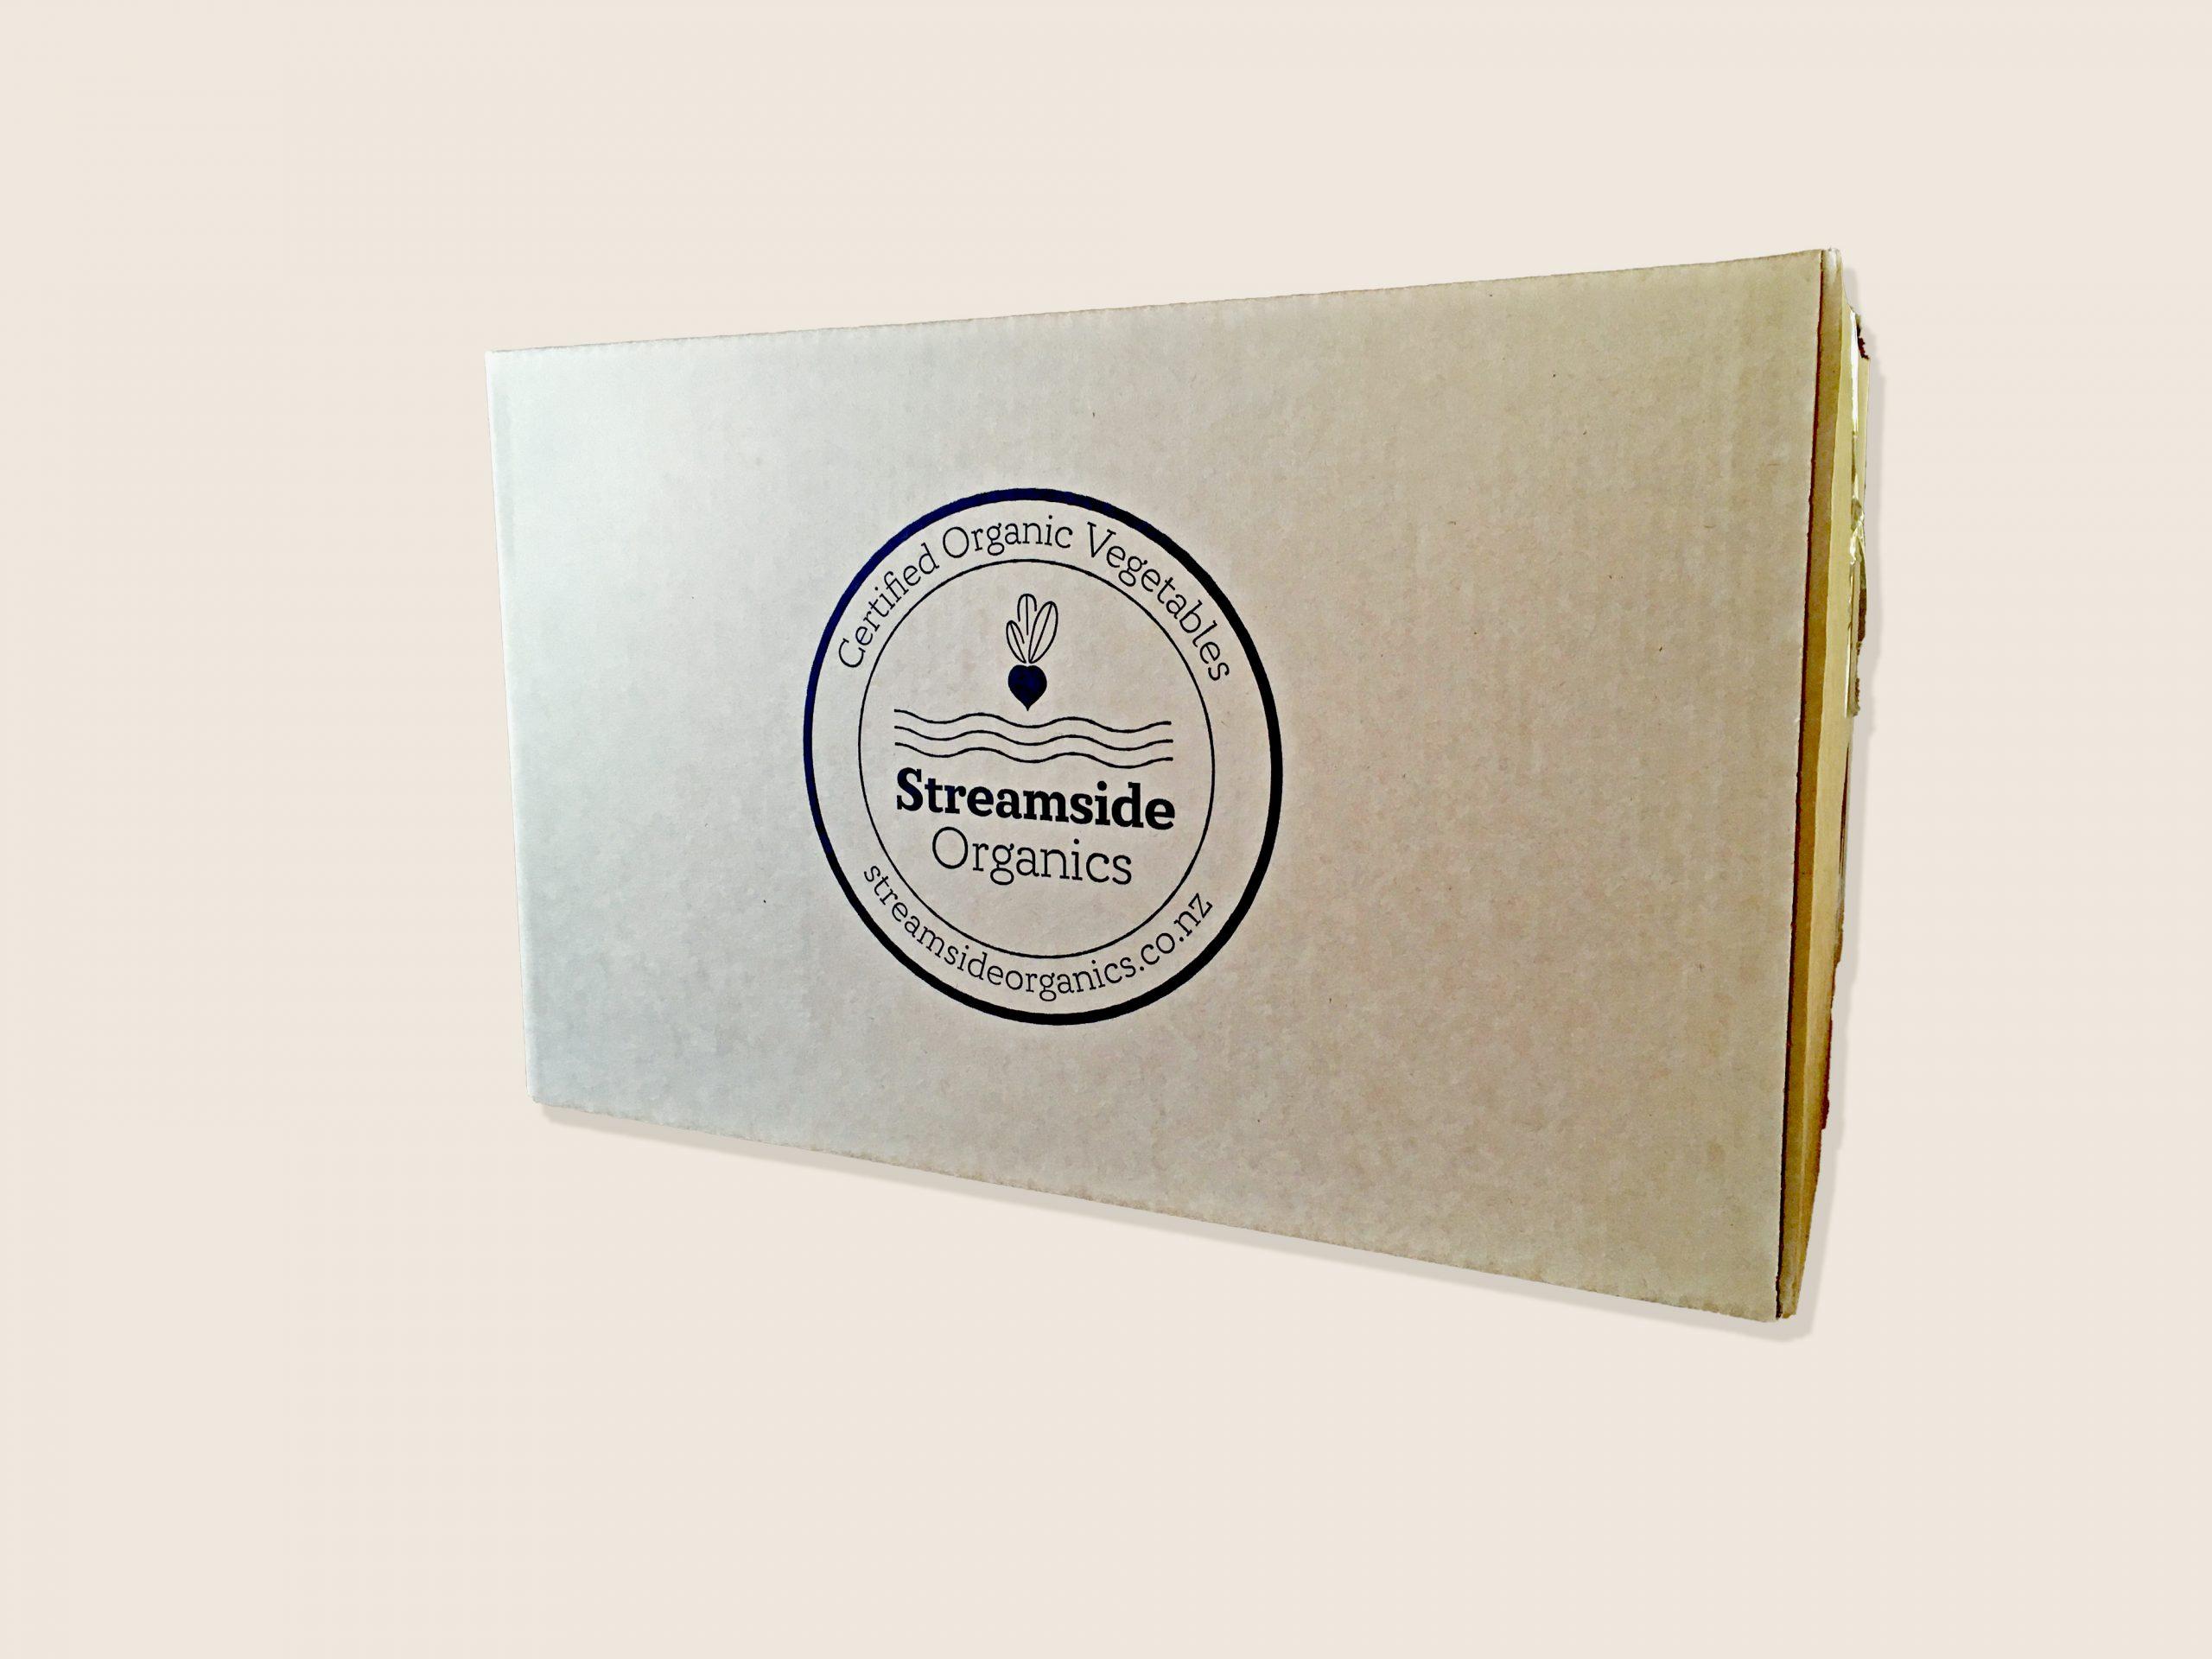 Streamside Organics Box